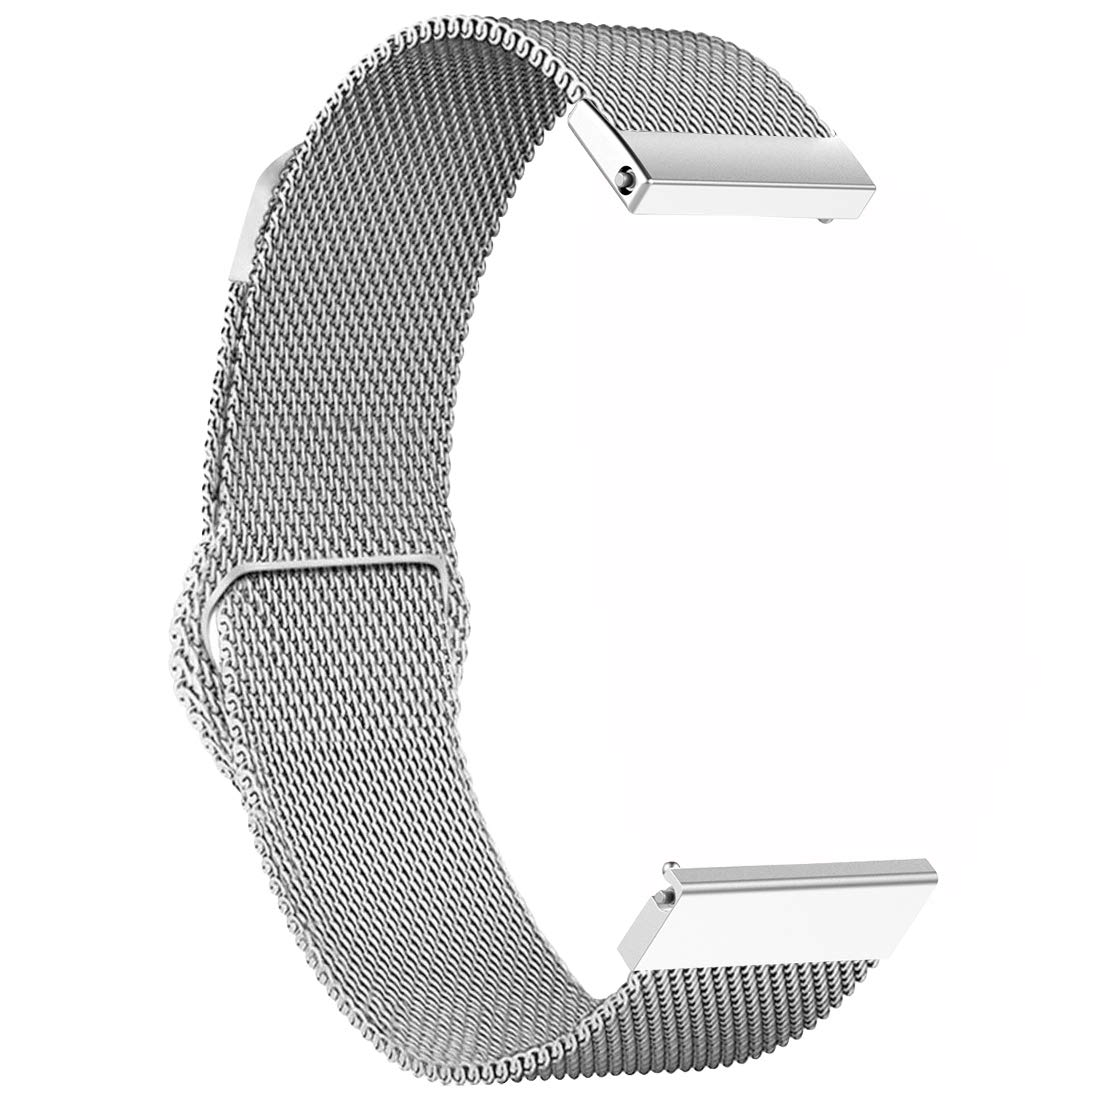 Para Asus Zenwatch 2 wi502q correa para reloj, chofit 18 mm banda ...